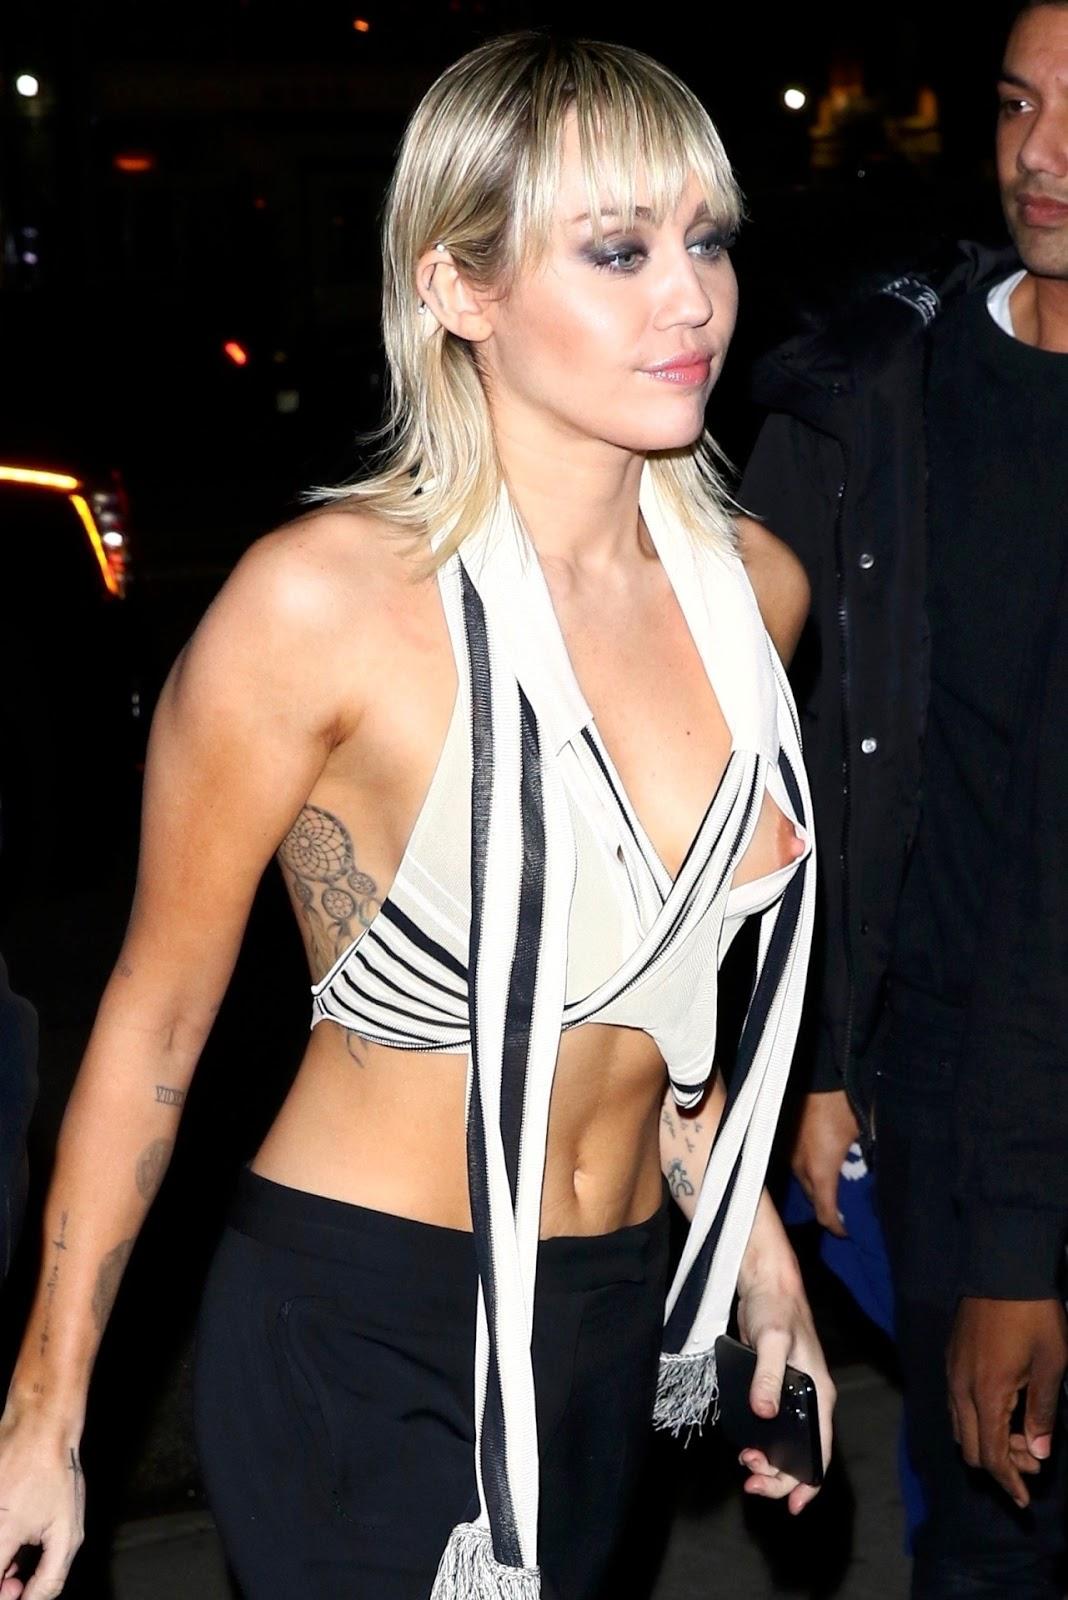 Miley Cyrus suffers wardrobe malfunction after runway moment at New York Fashion Week